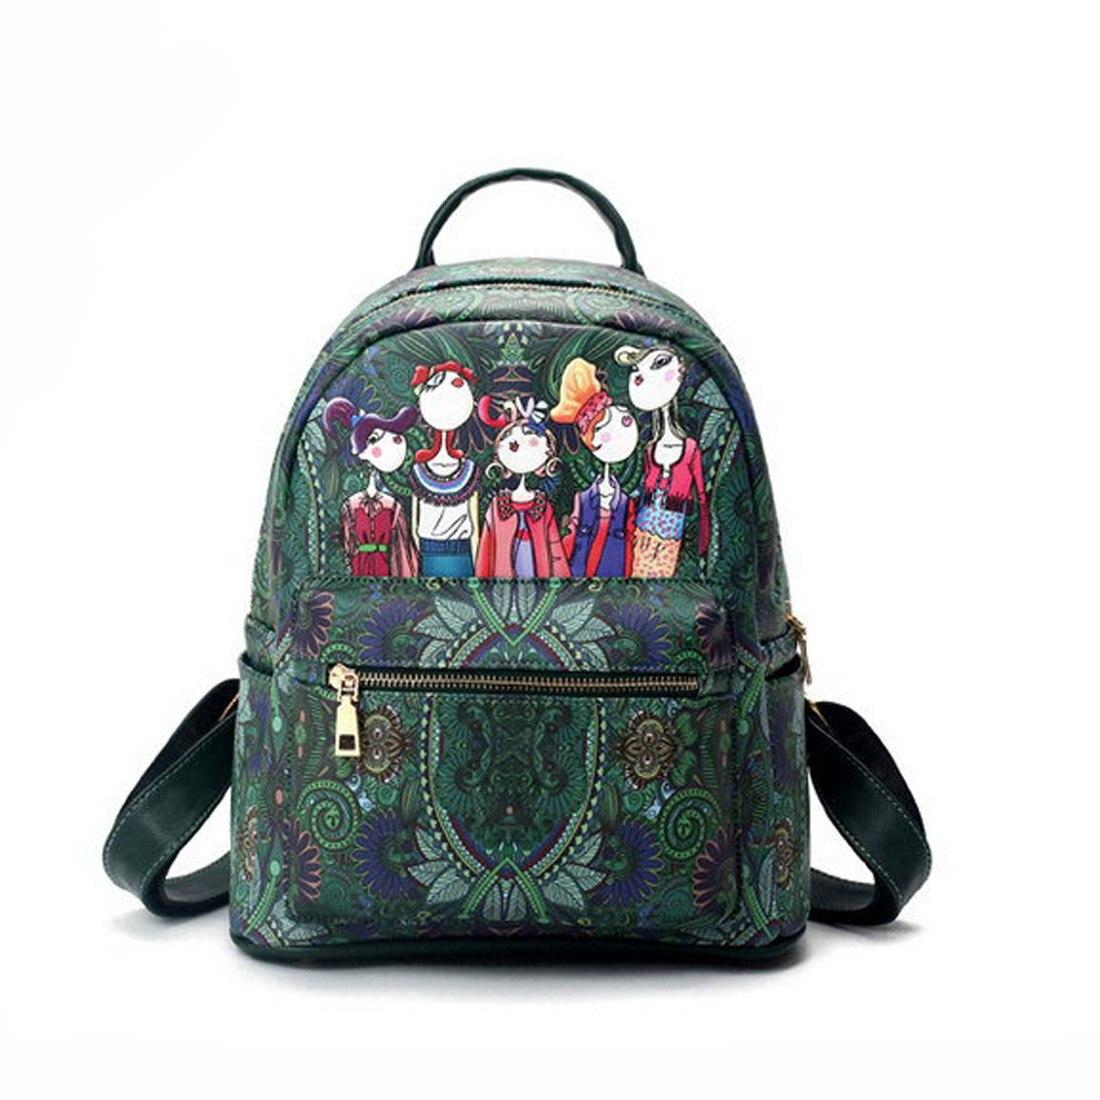 2017 New Printing Backpack PU Leather Women Backpack School Bags For Teenagers Fashion Rucksack Designer Back